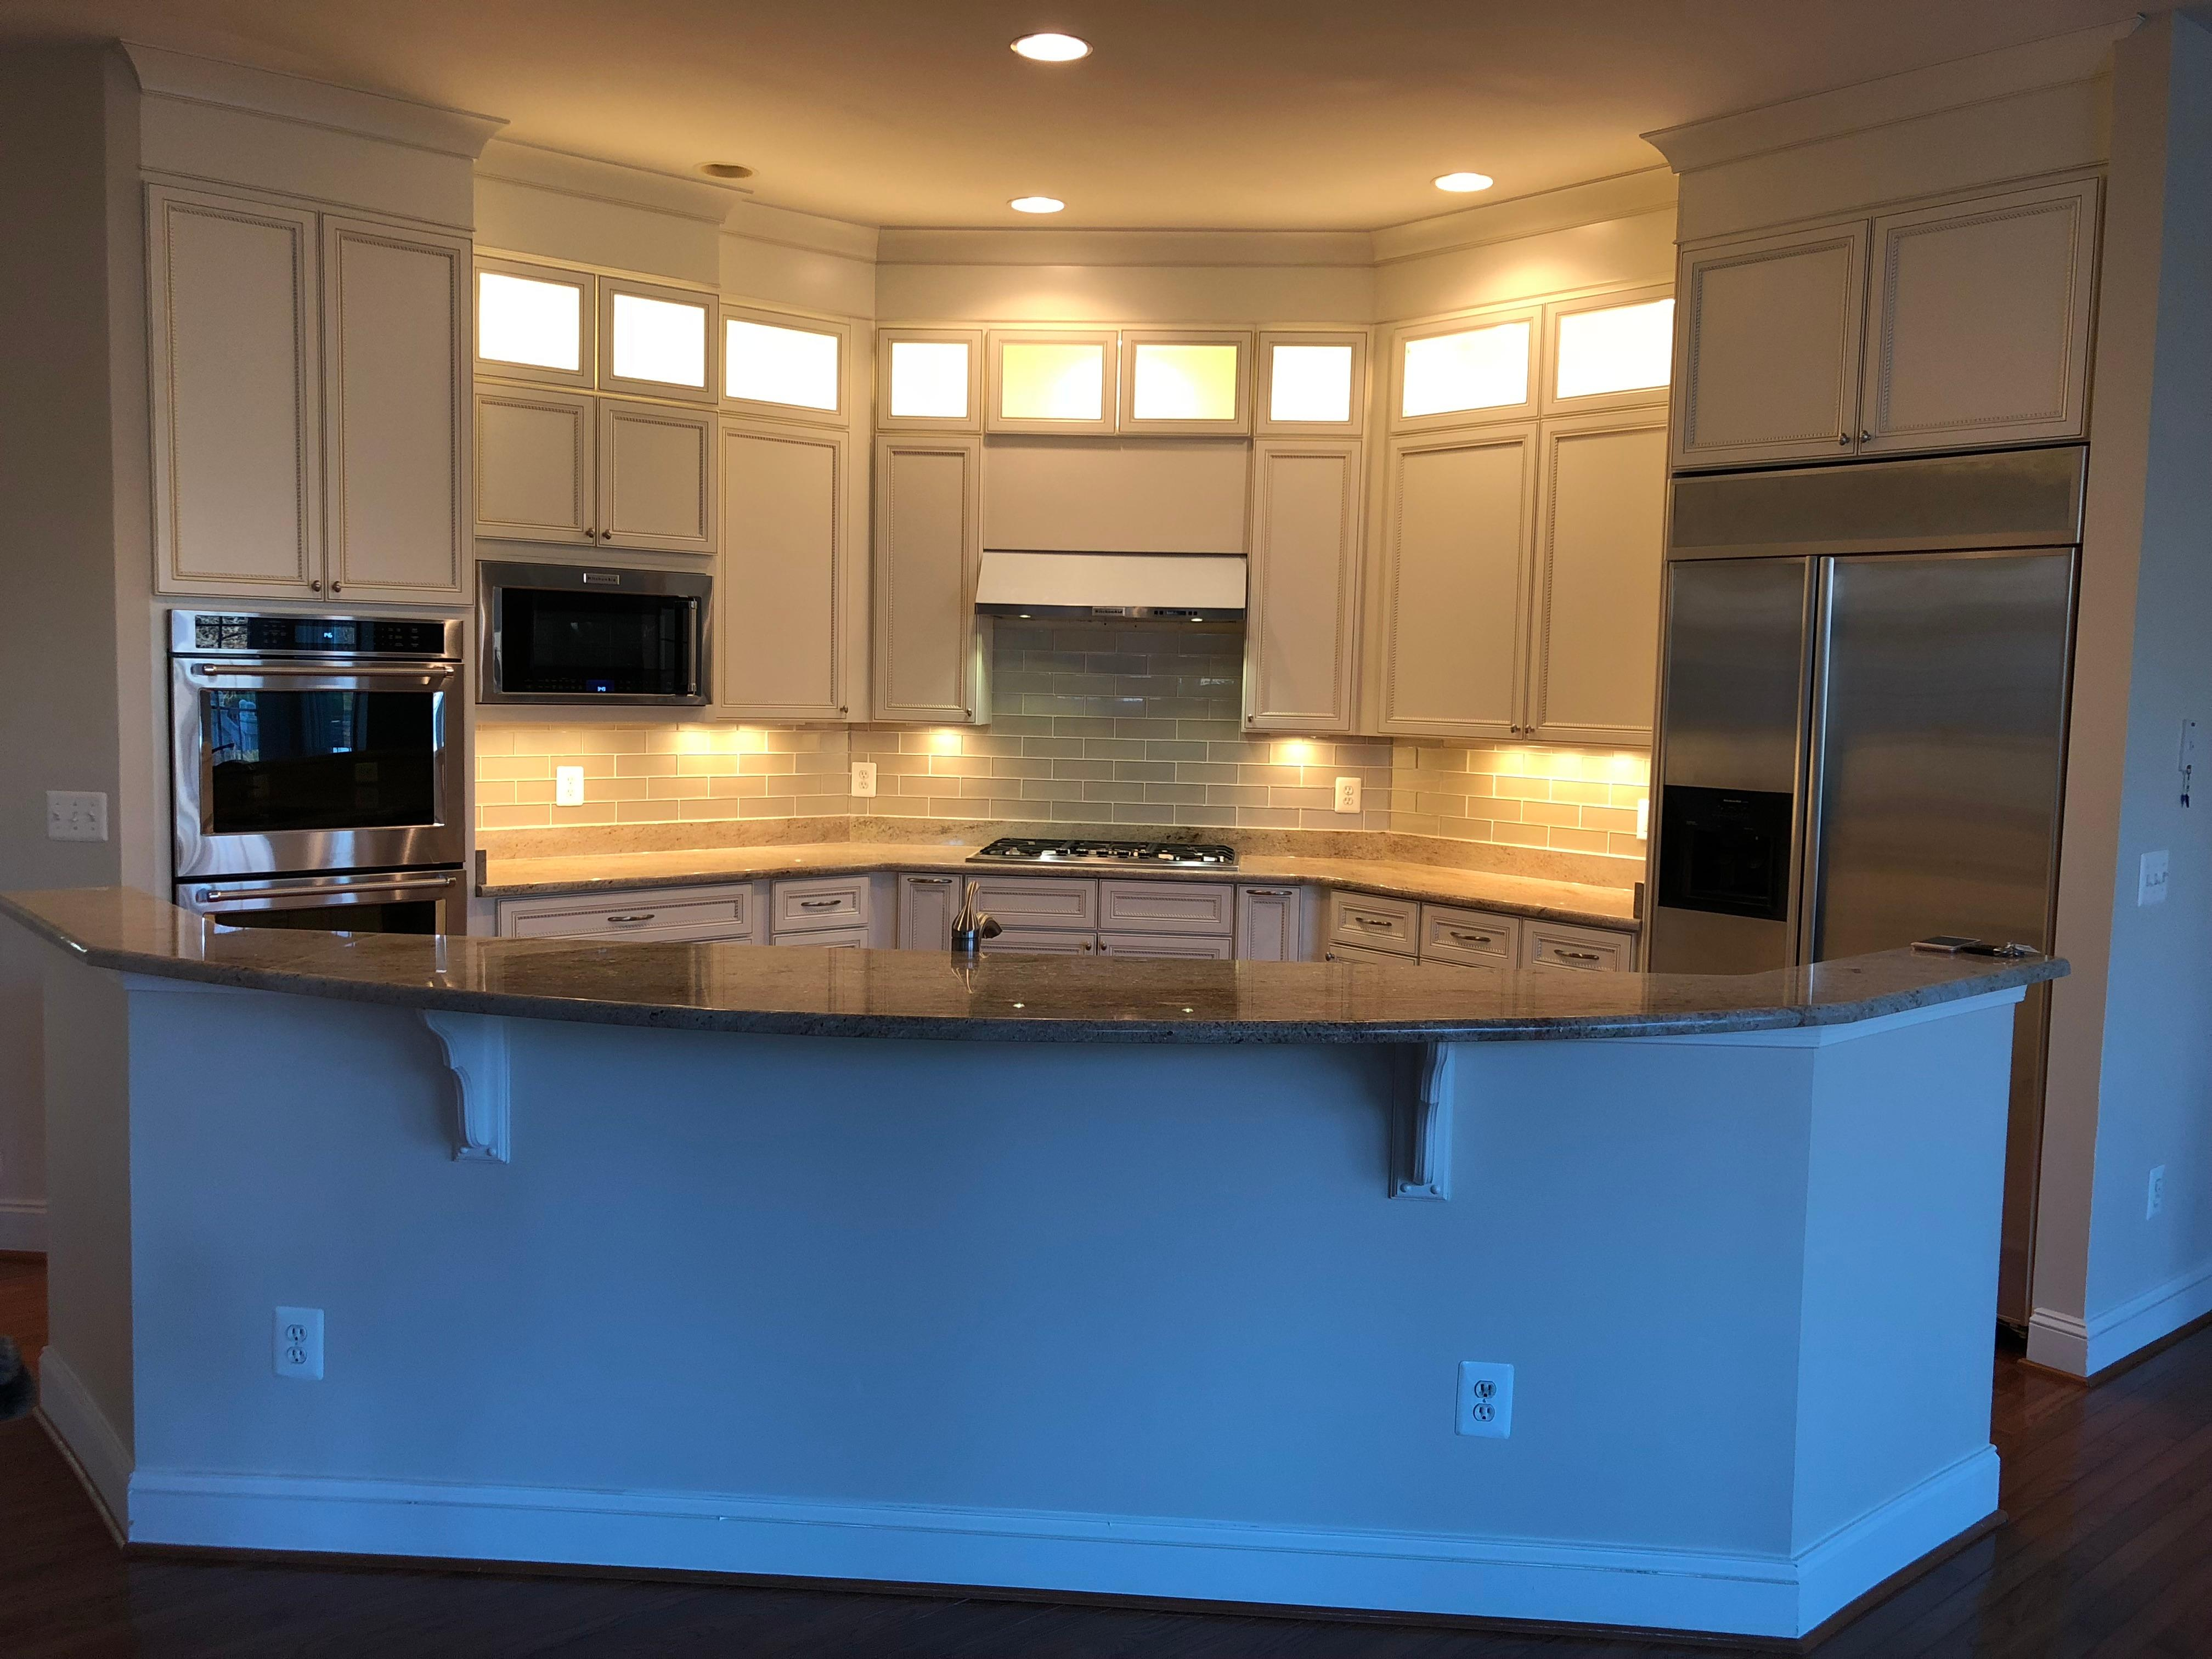 Home Design Center & Flooring image 2